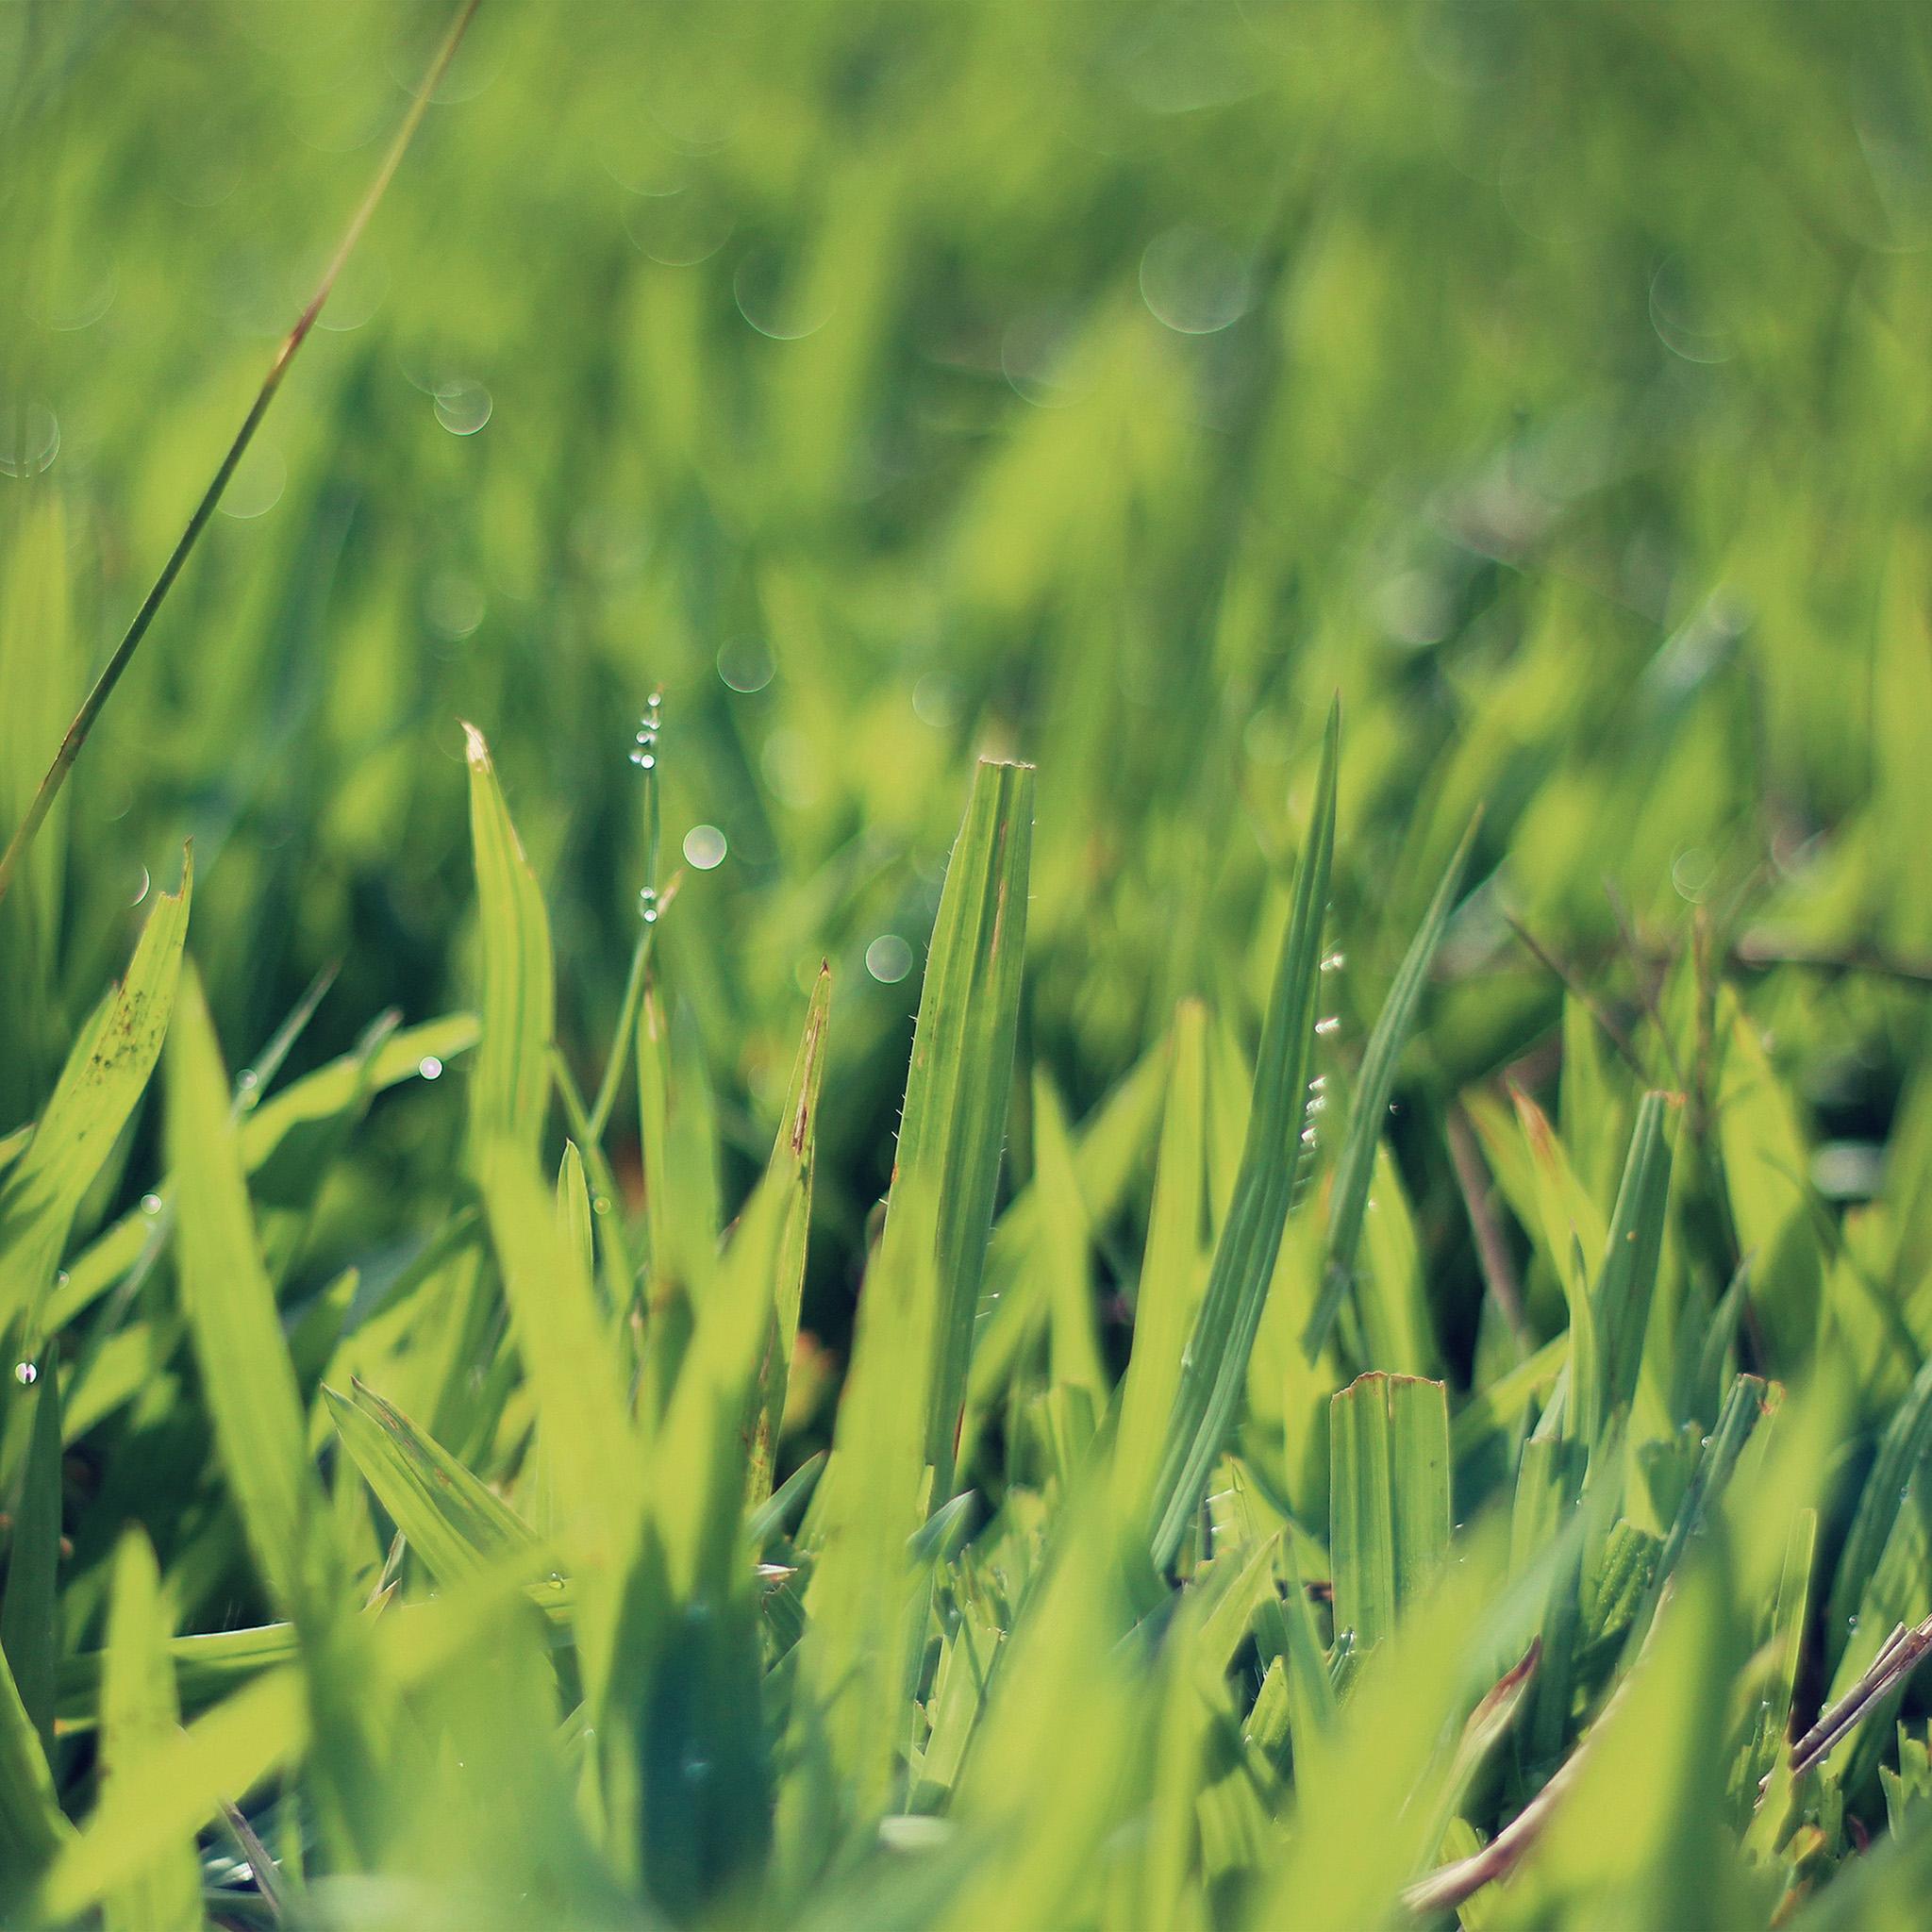 Na04-green-leaf-lawn-flower-nature-wallpaper